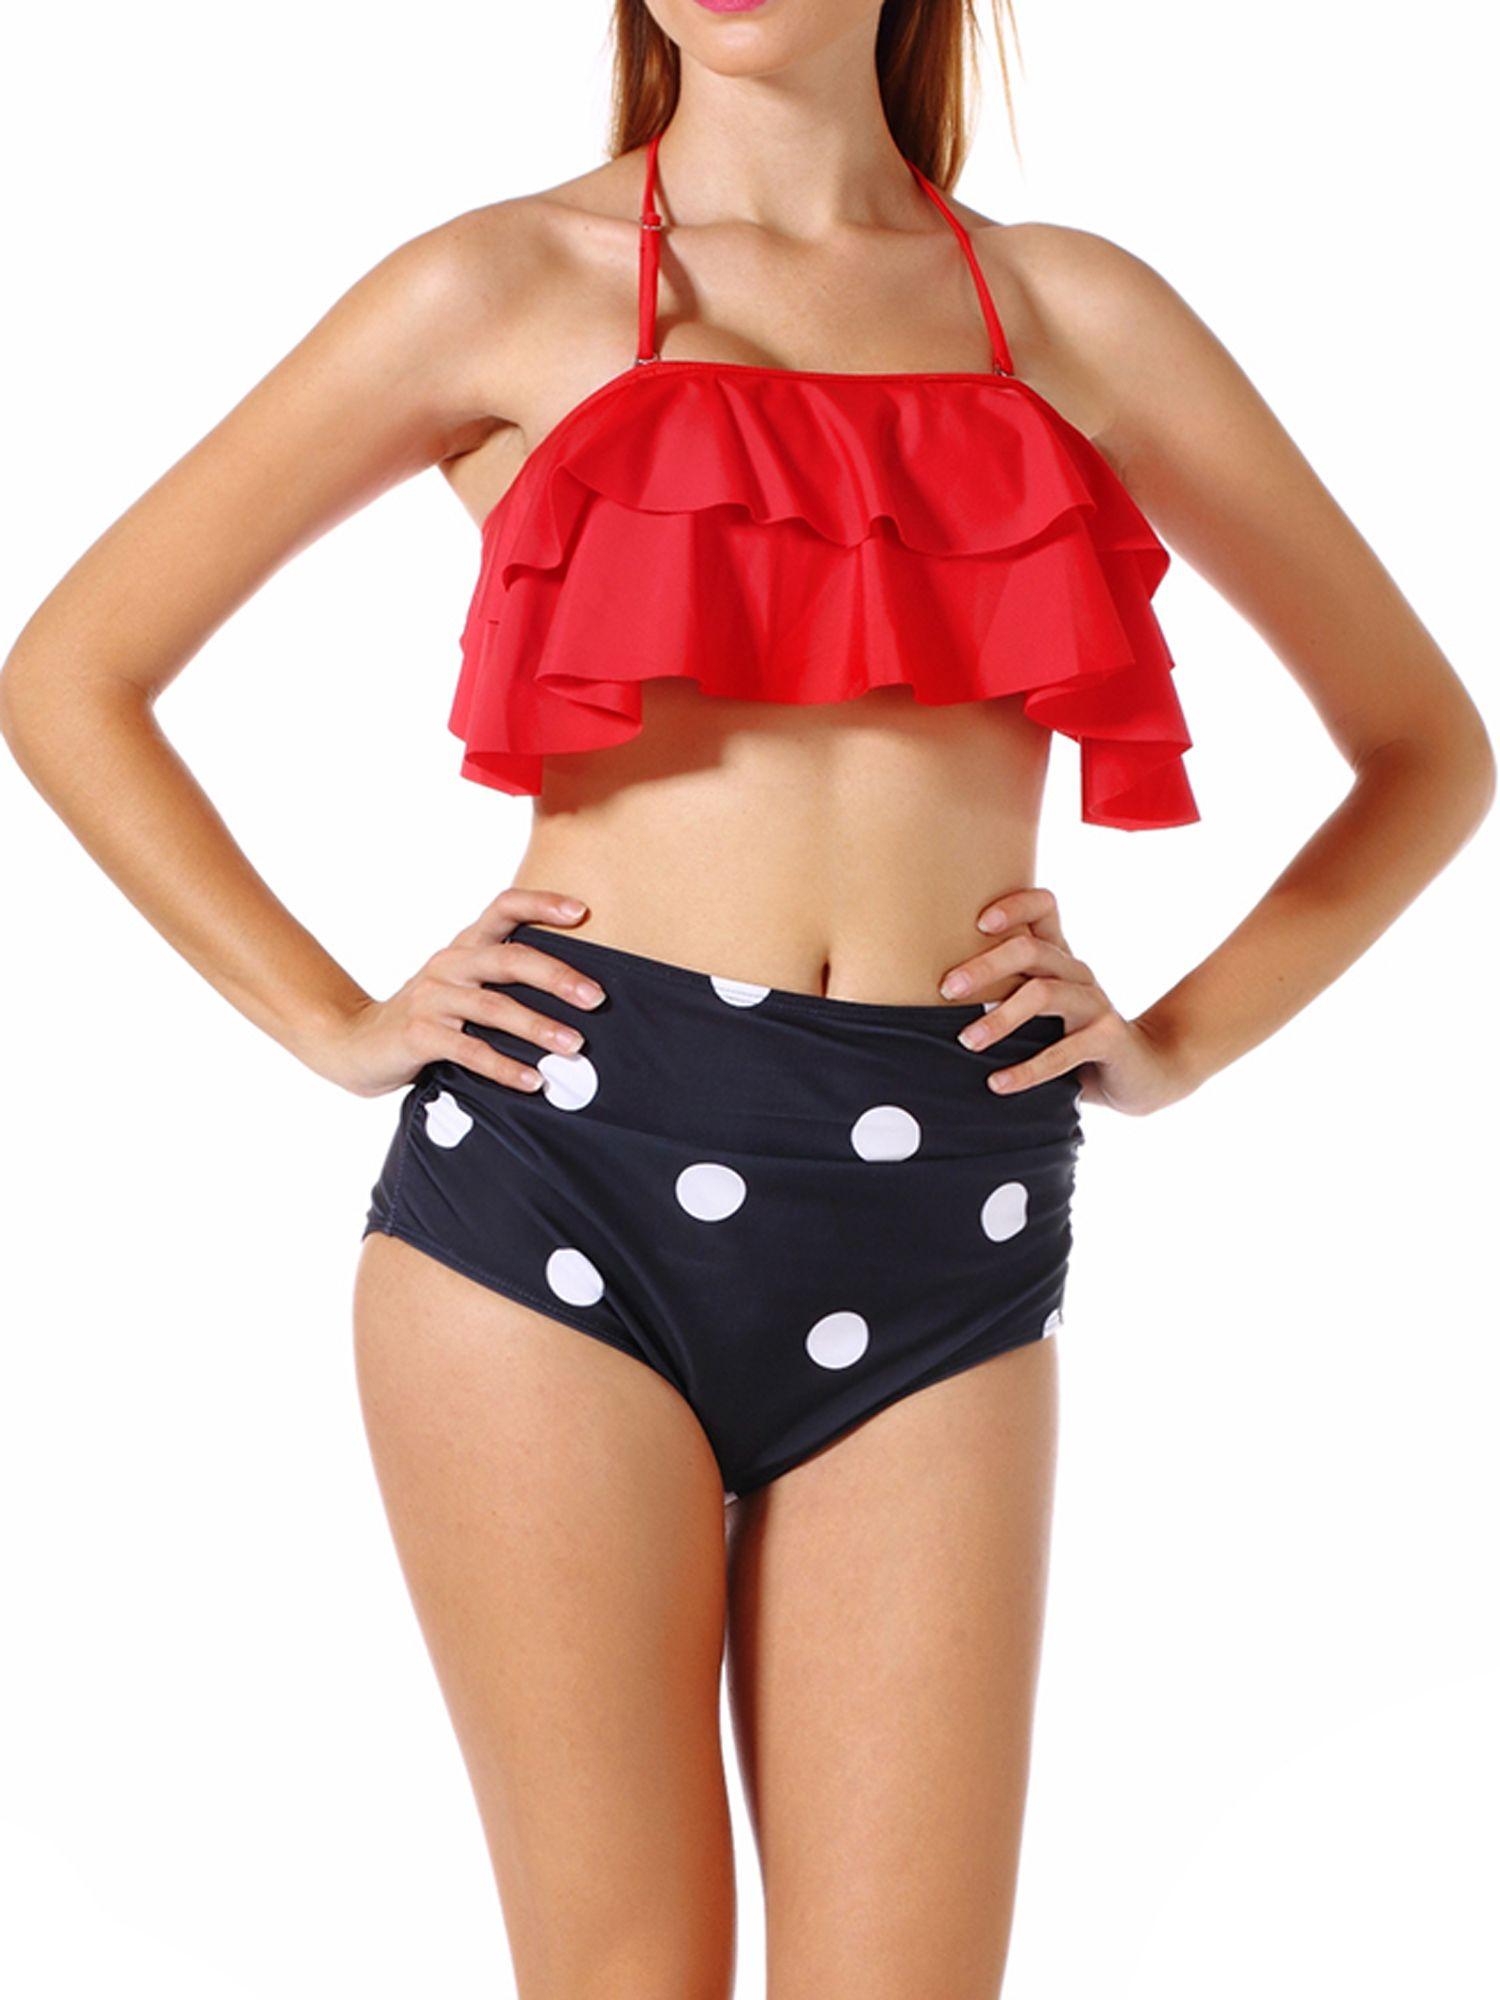 6a4d200604 2018 Swimwear Women High Waist Triangle Bikini Set Bandage Push-Up Swimsuit  Bathing Suit New Style#Waist, #Triangle, #Bikini